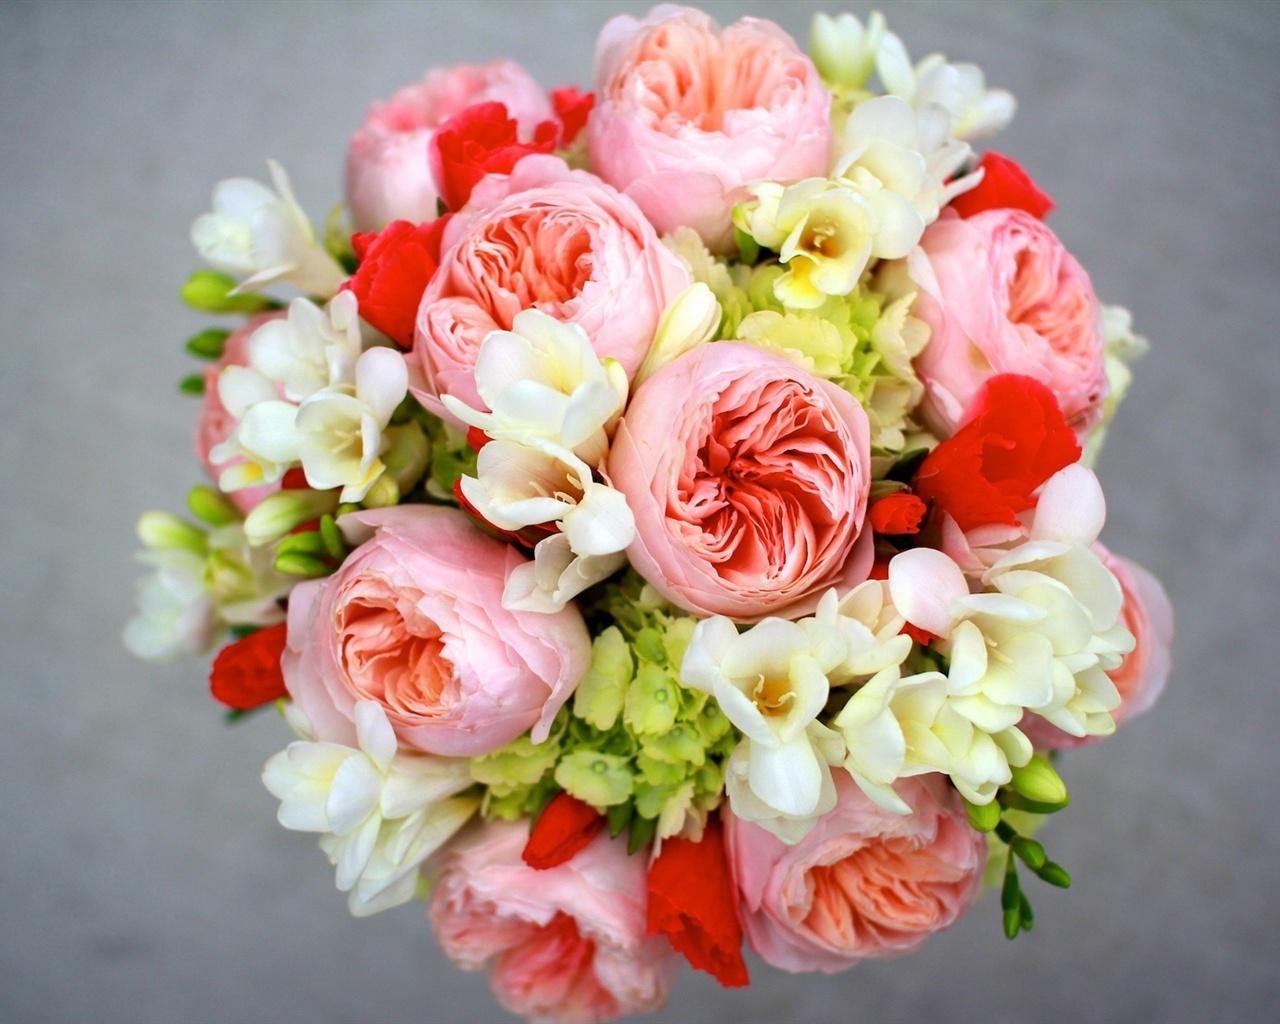 Freesia flower bouquet comousar freesia flower bouquet freesia flower bouquet freesia izmirmasajfo Gallery